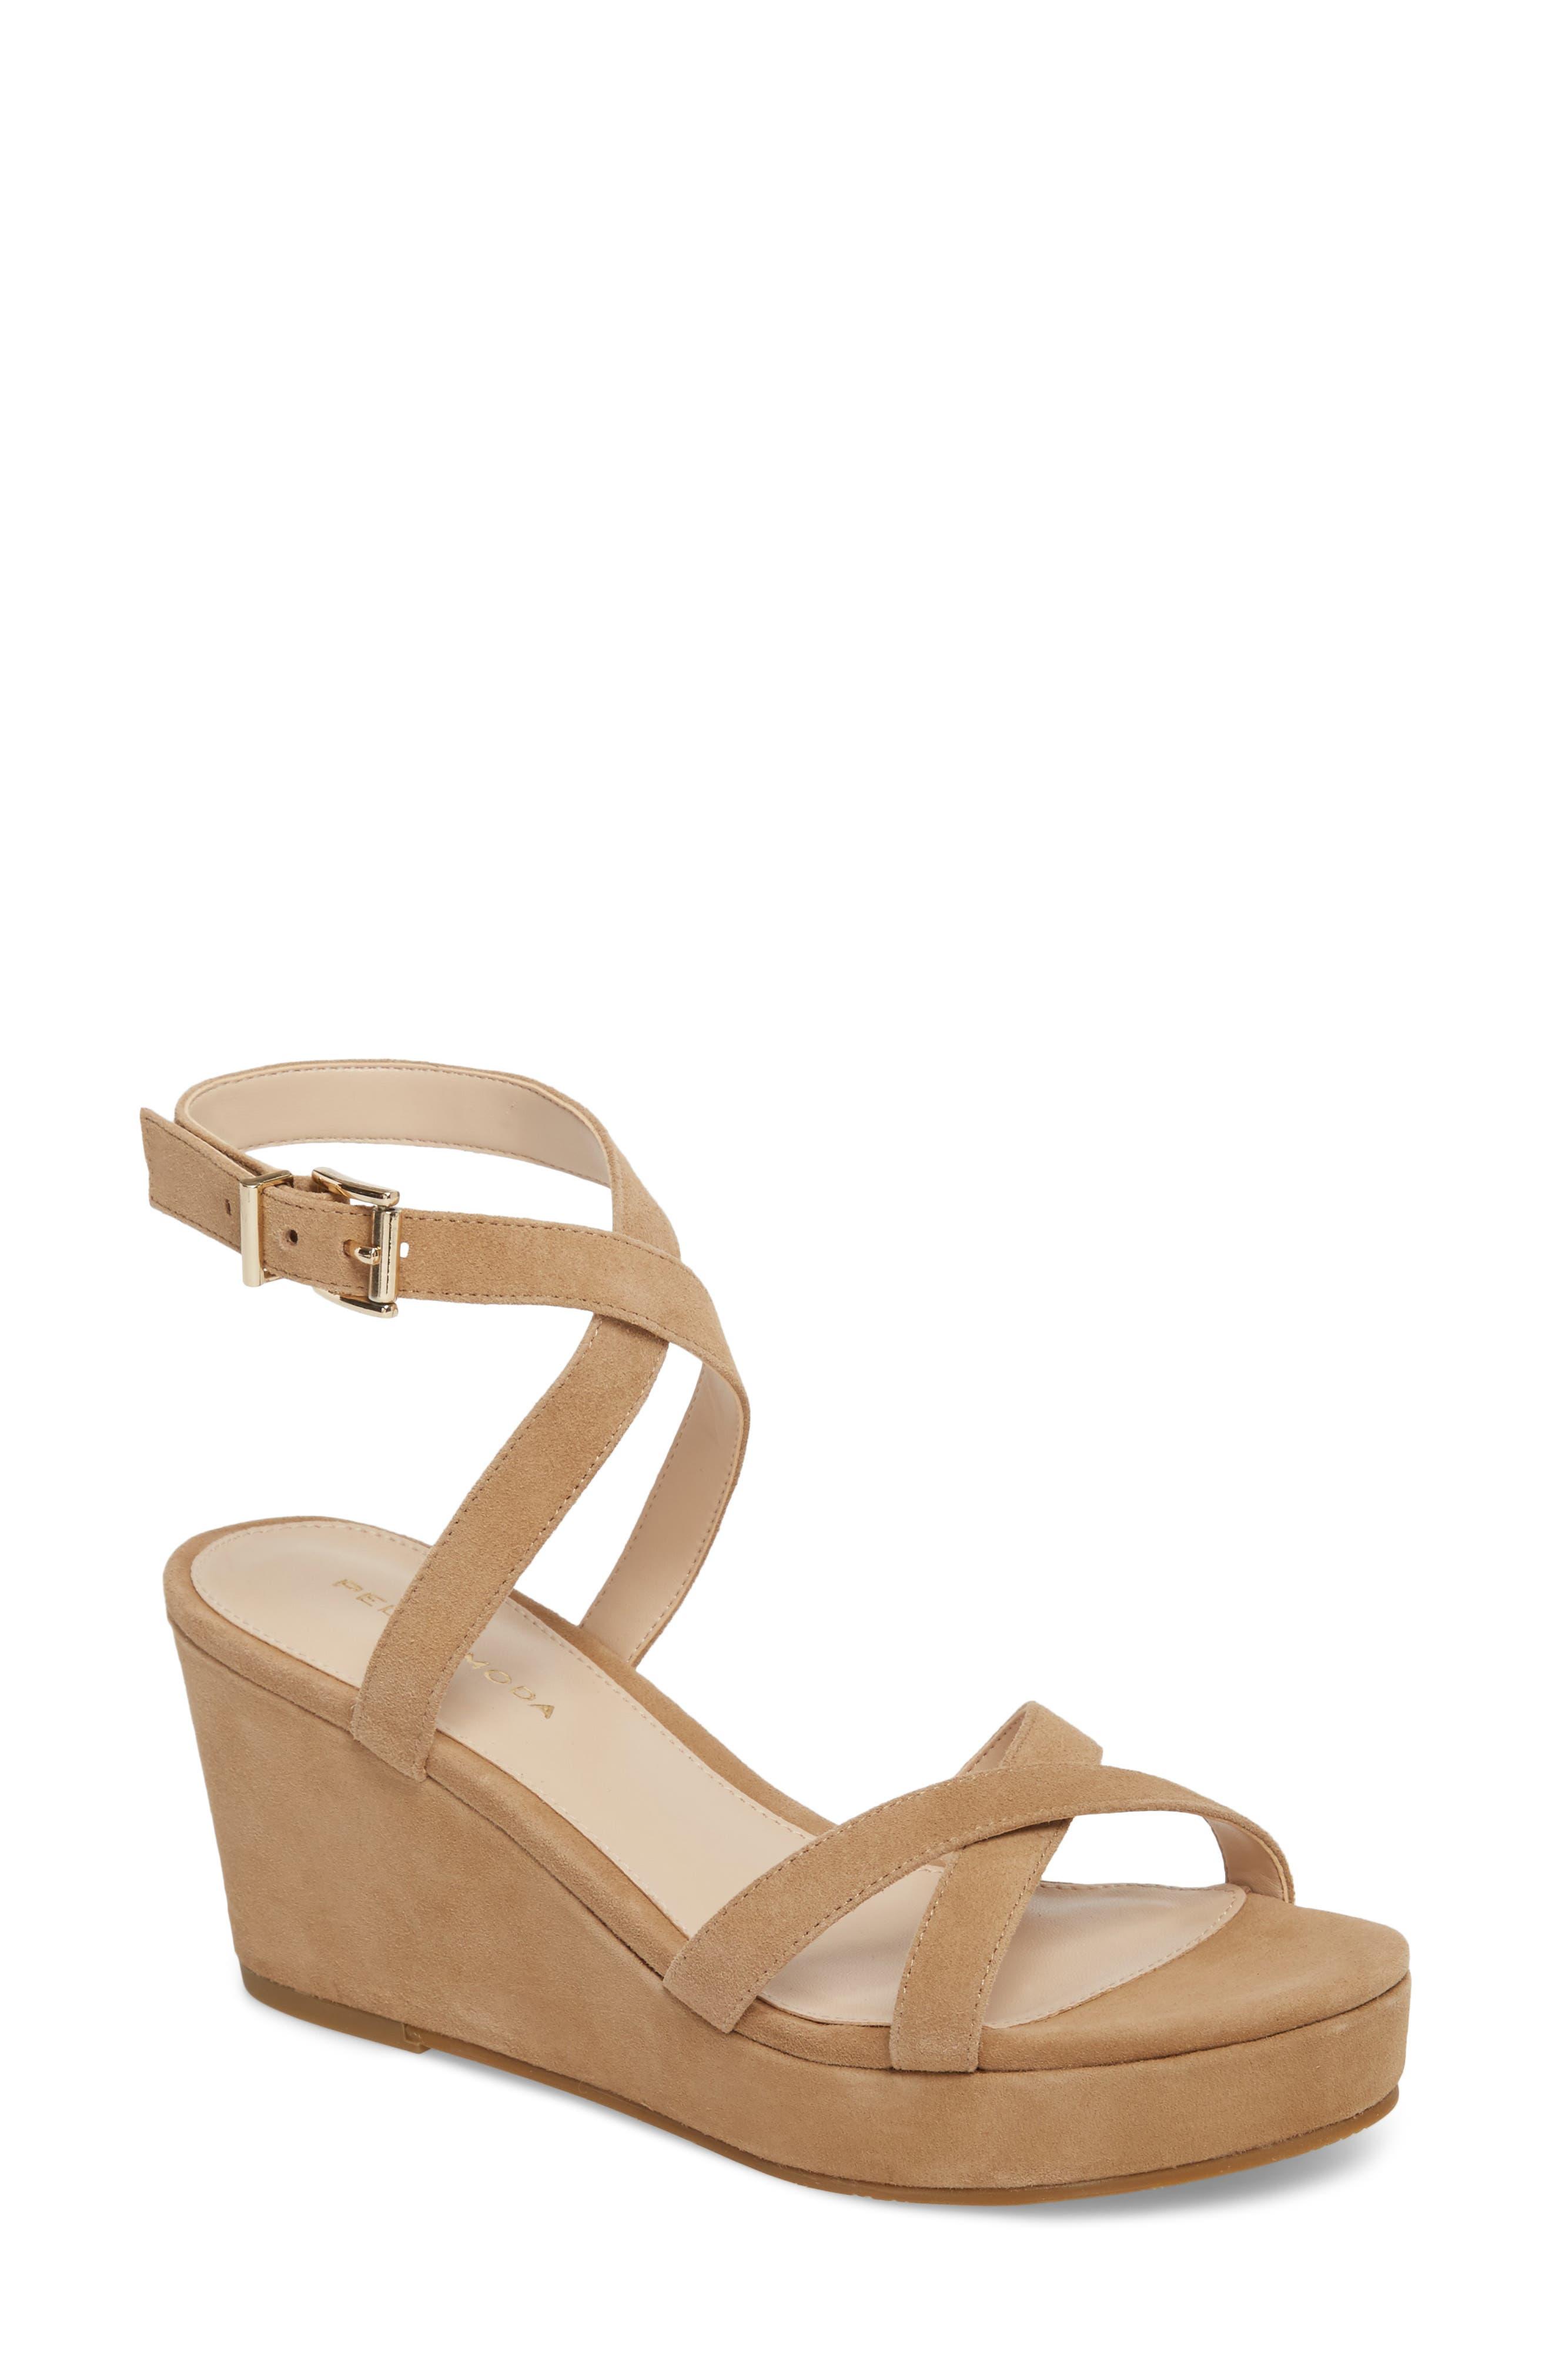 Alternate Image 1 Selected - Pelle Moda Keo2 Platform Wedge Sandal (Women)